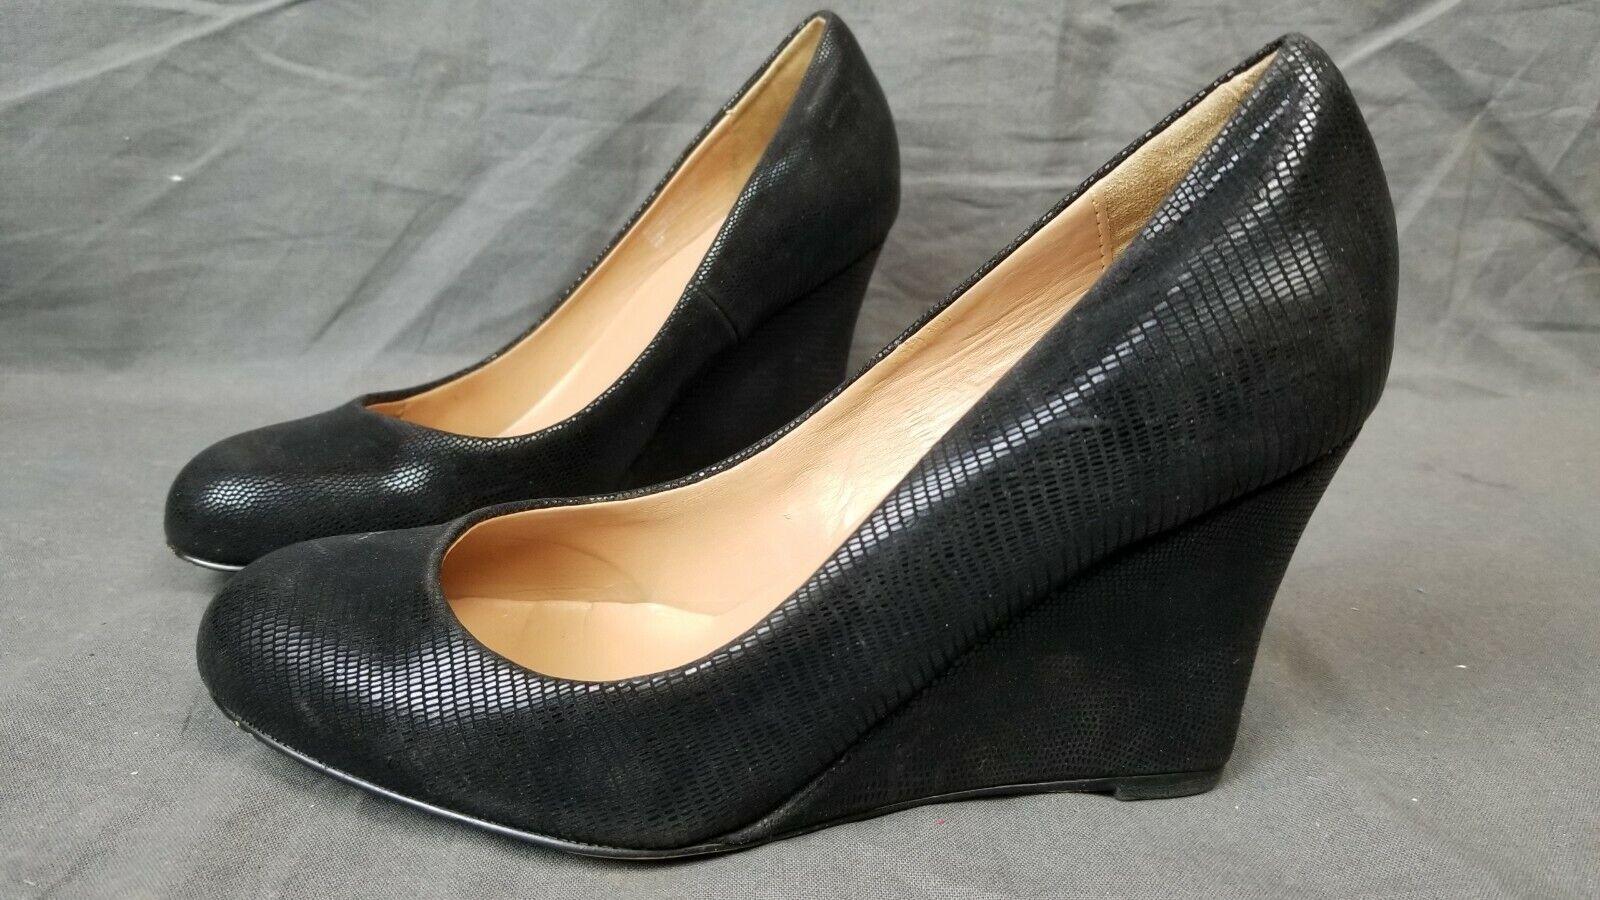 Ann Taylor Black Snake Print Wedges Heels 3.125  US 6M EU 36 UK 4